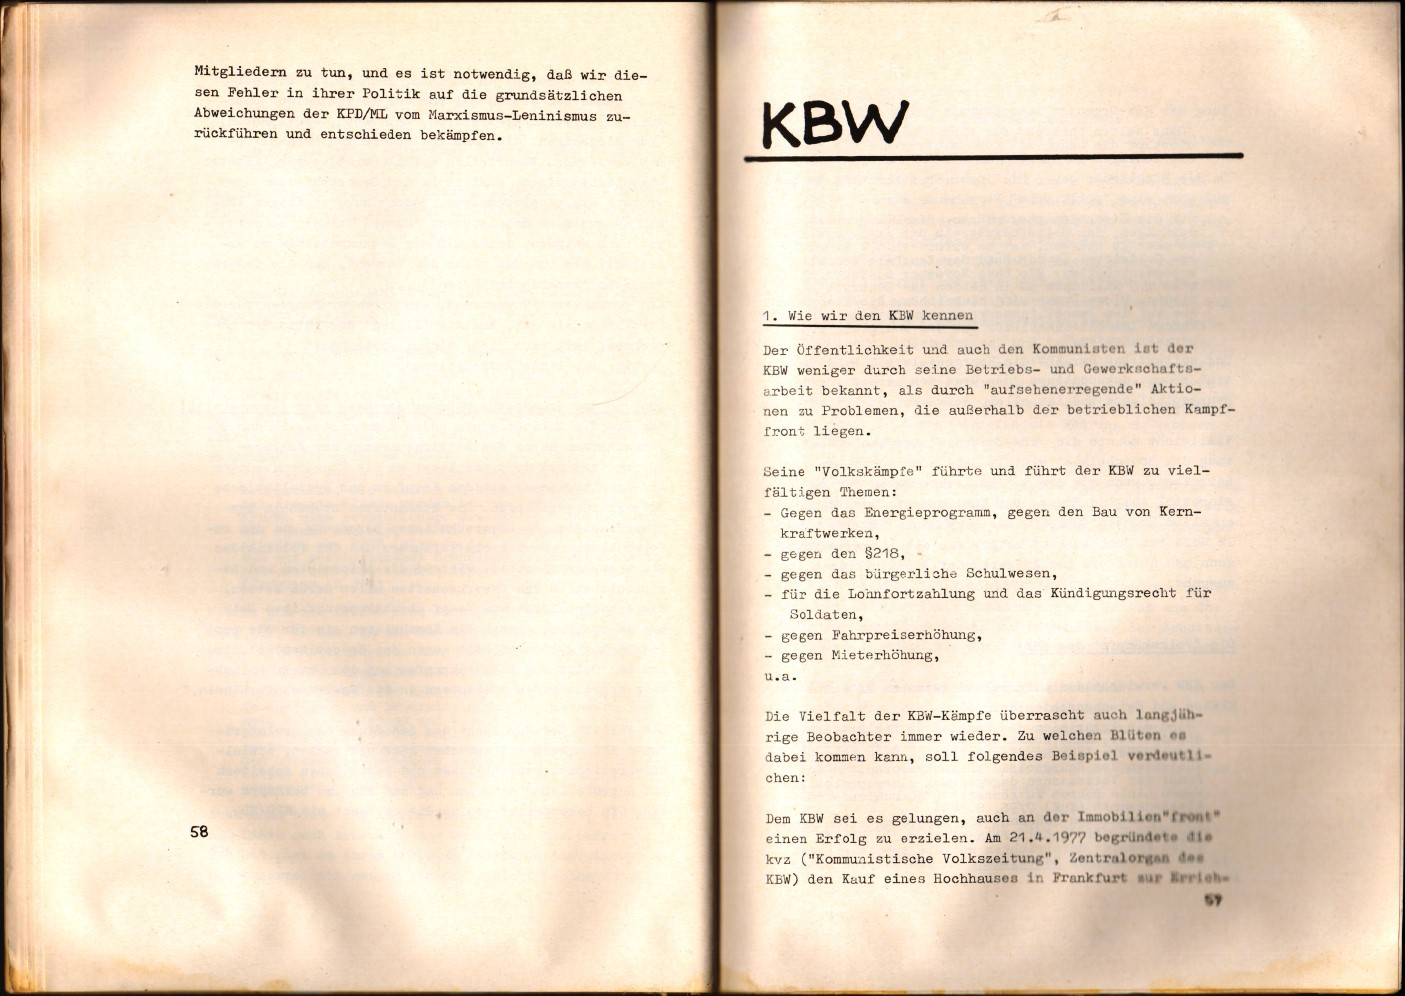 KABD_1978_Argumentationshilfen_31